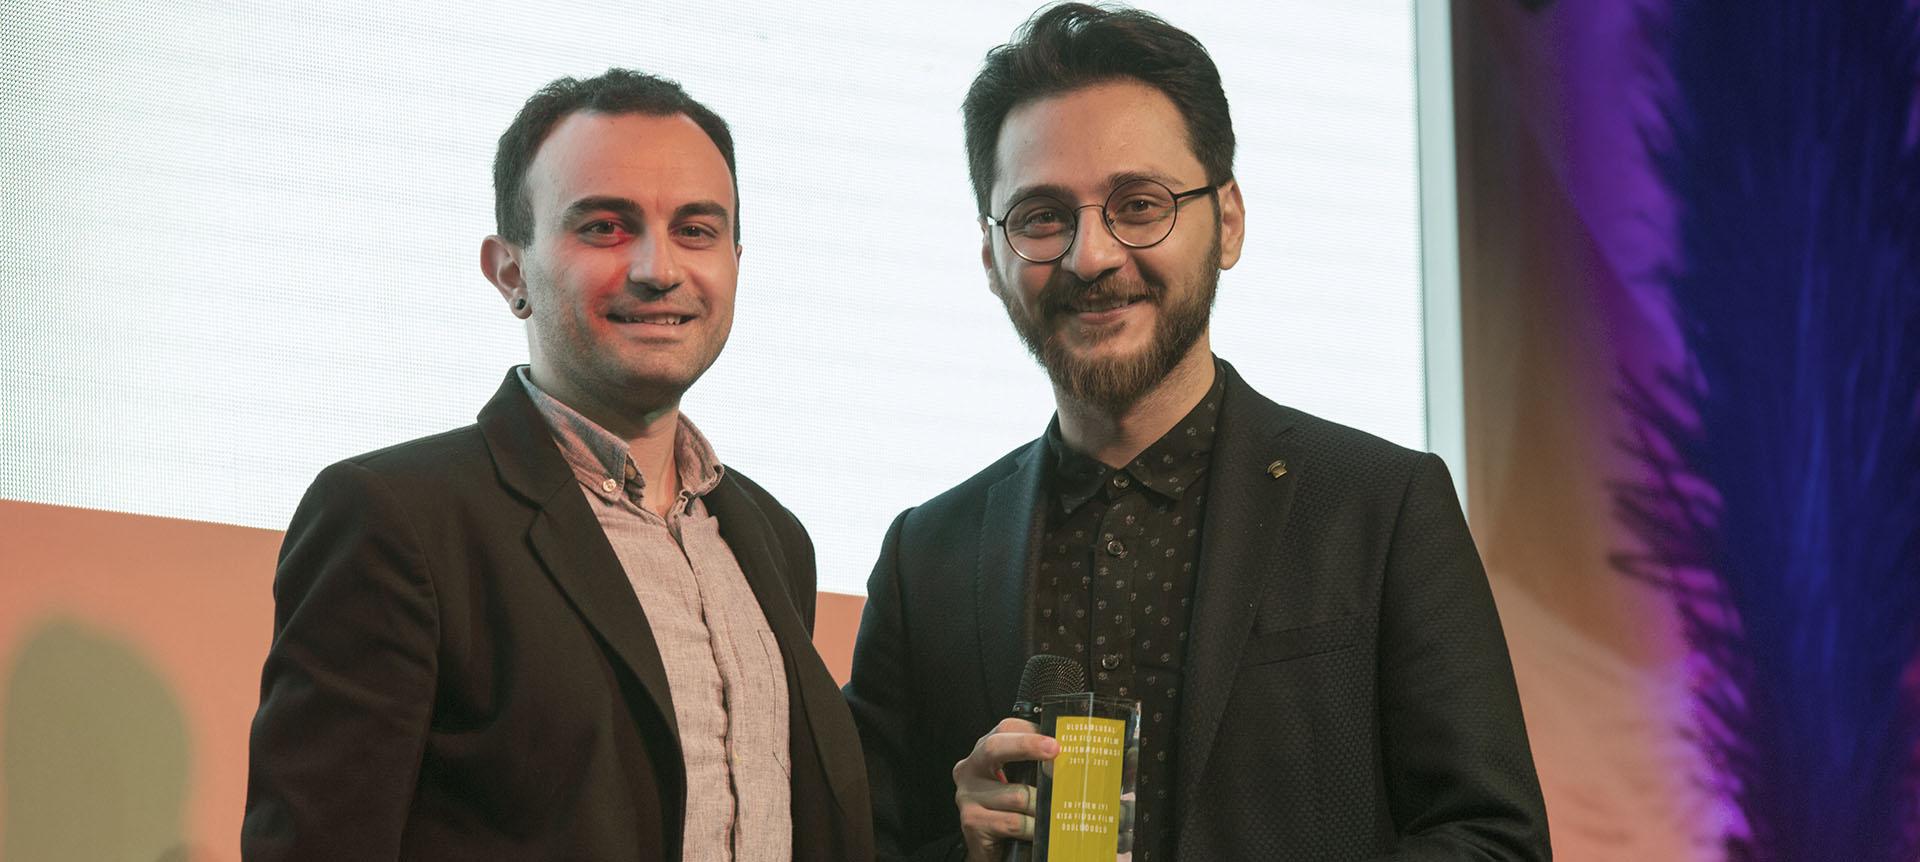 Festival awards presented